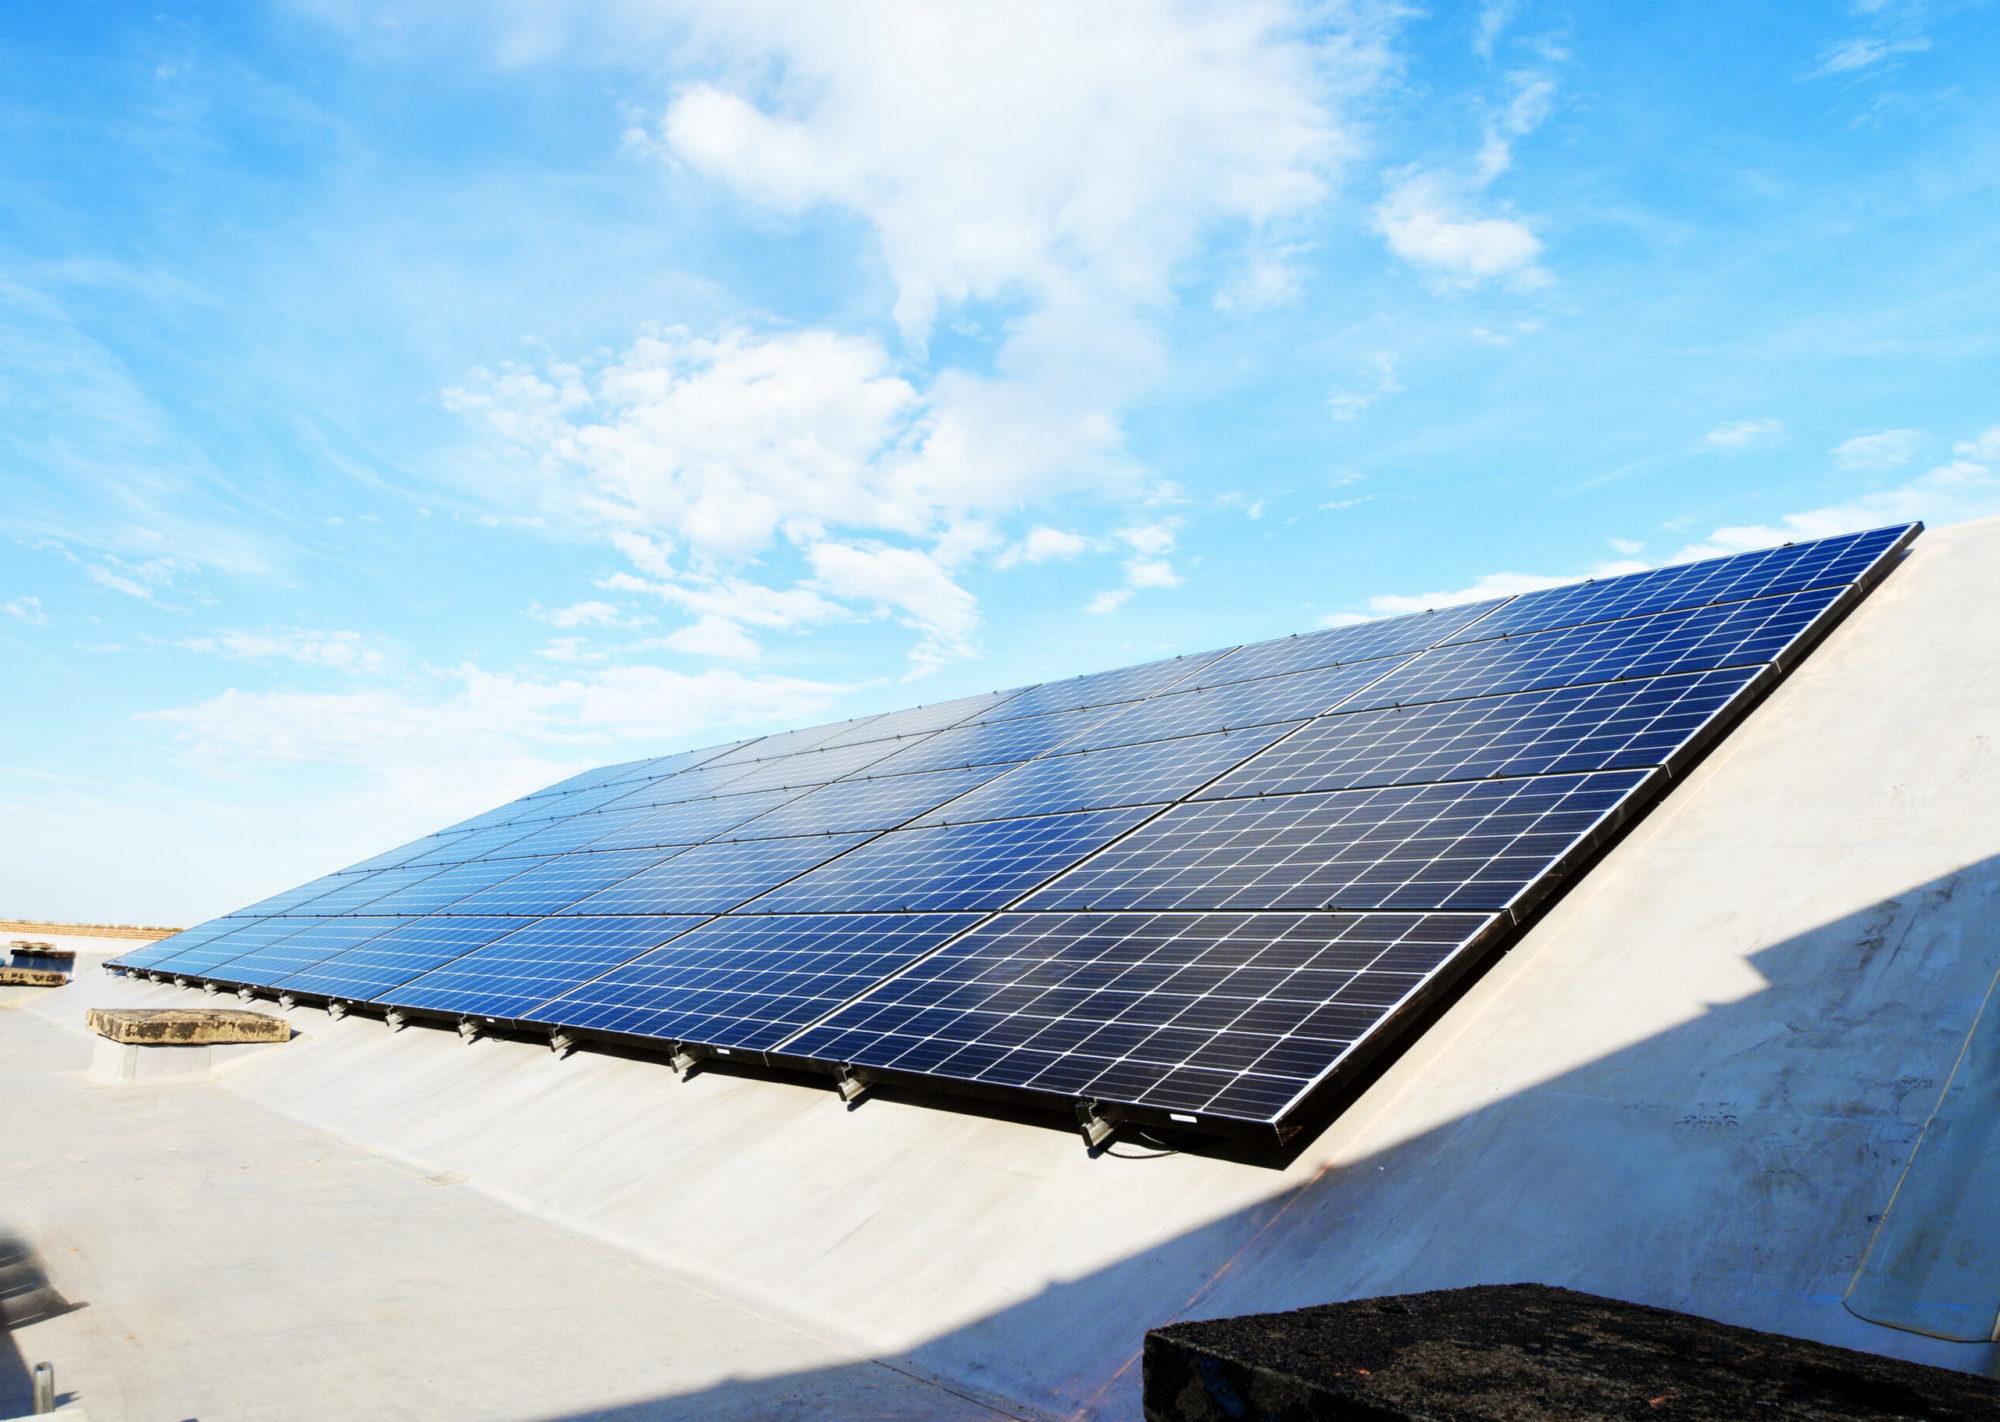 Picture of Bluestem's Rail Commercer Roof Solar Panels Project.